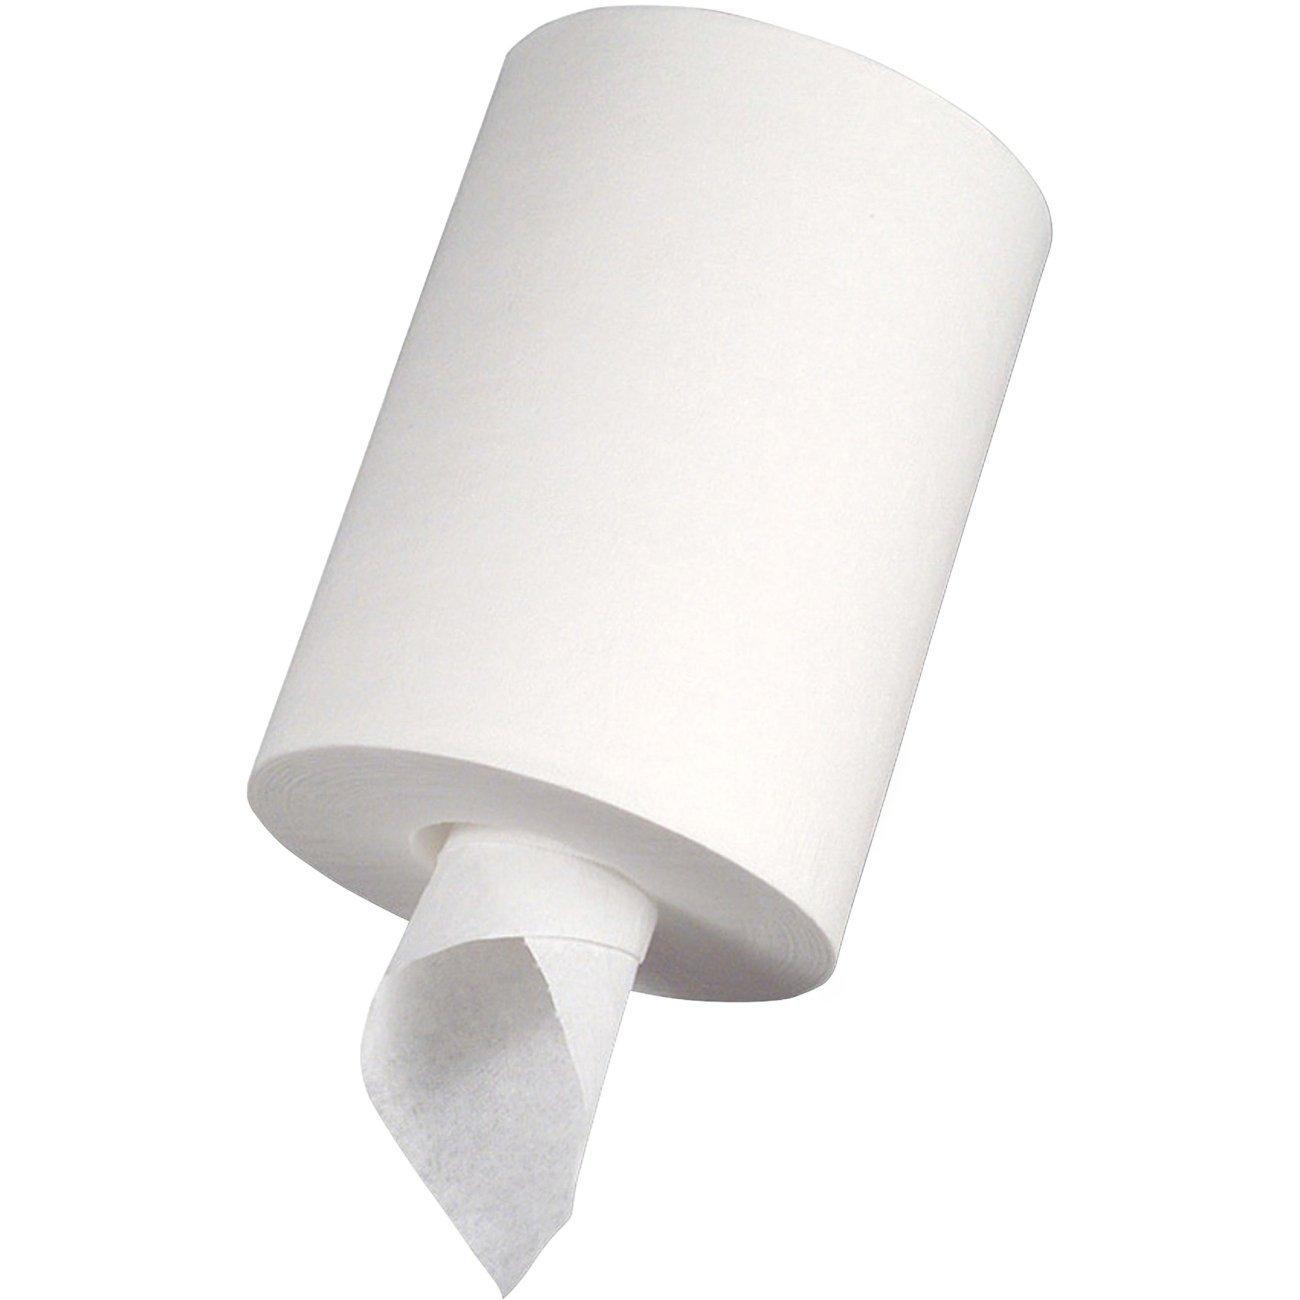 Genuine Joe GJO23600 Center Pull Paper Towels, 600 Sheets, White (5 Cases)